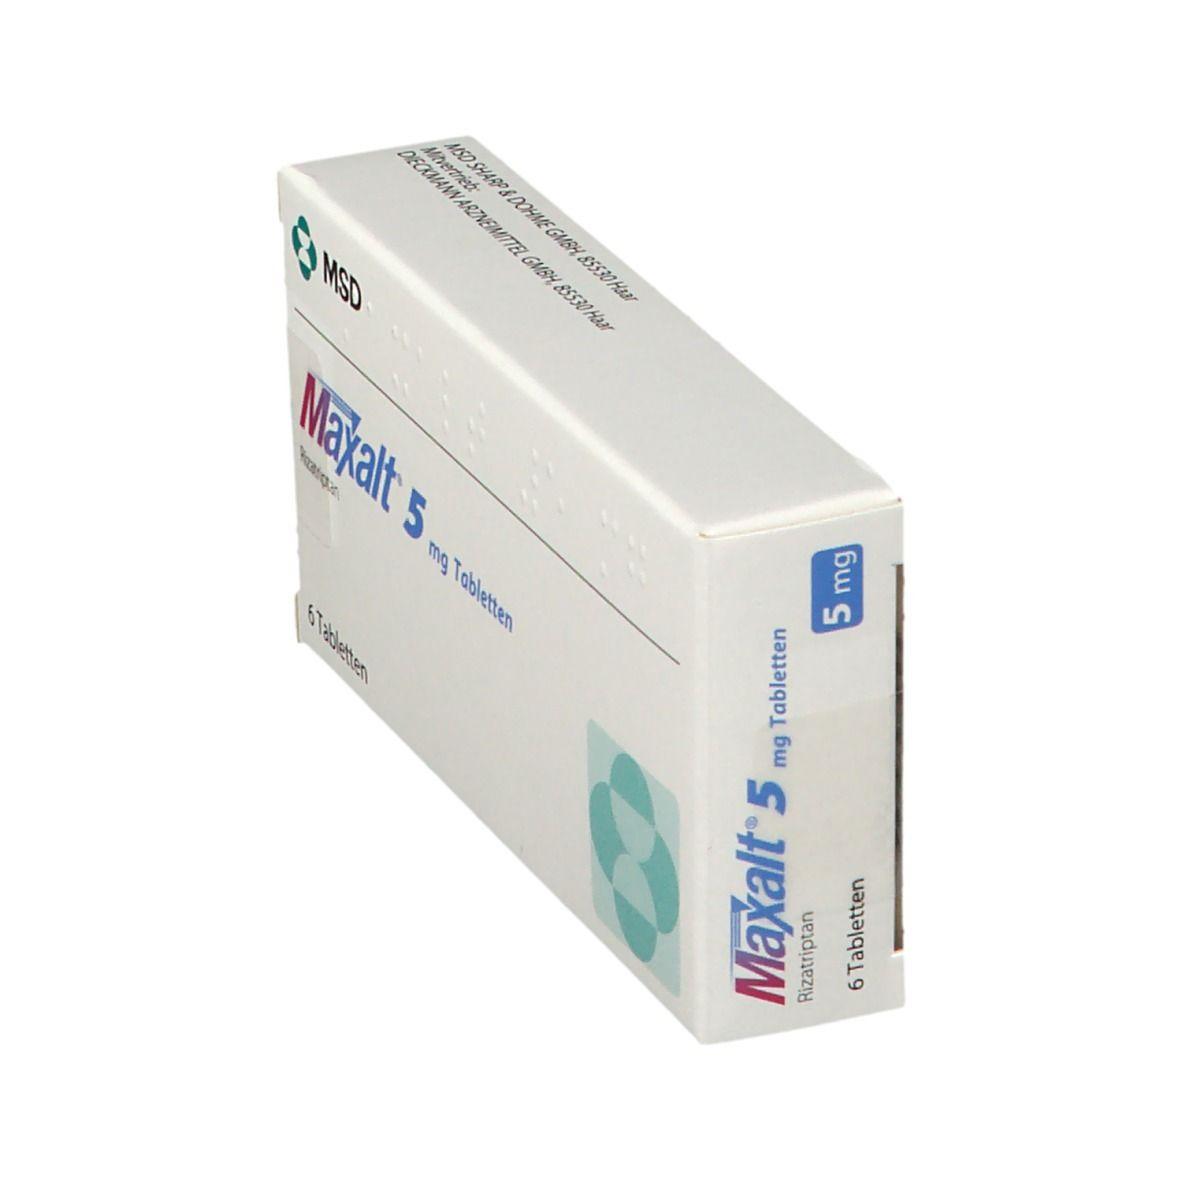 Maxalt 5 mg Tabletten